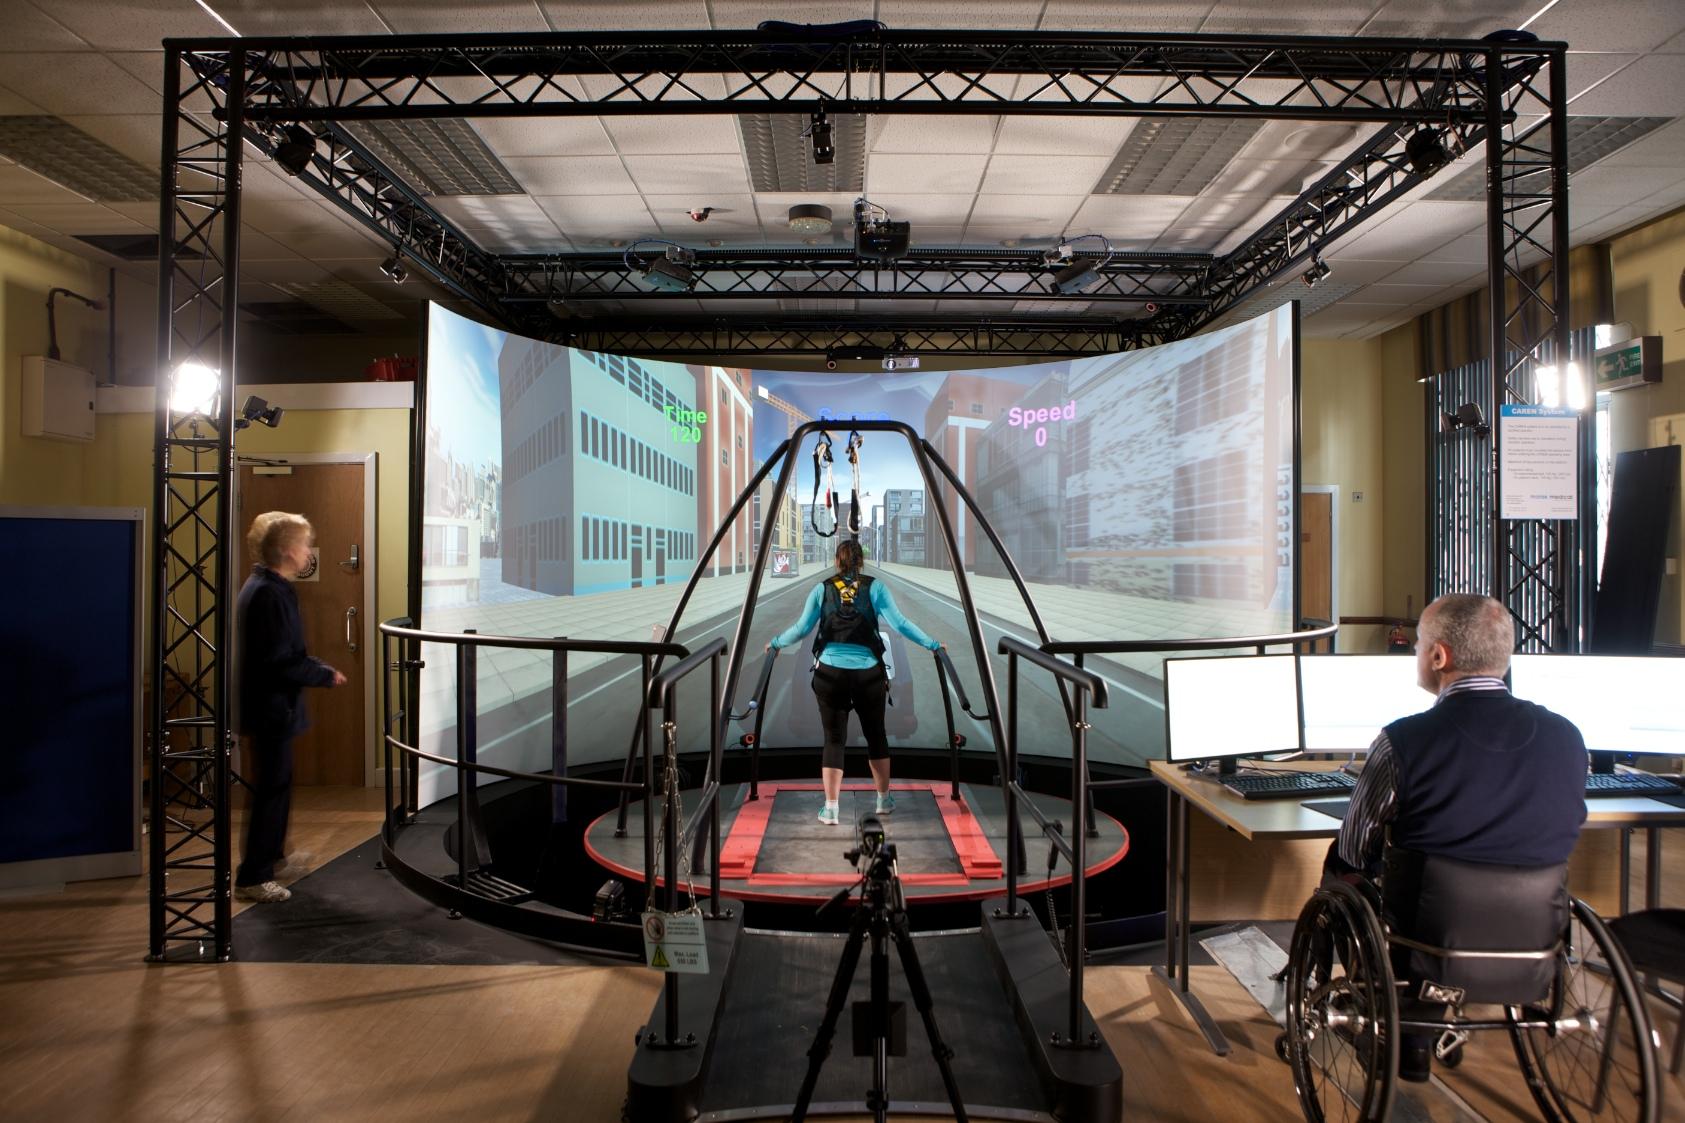 CAREN - Computer Assisted Rehabilitation Environment